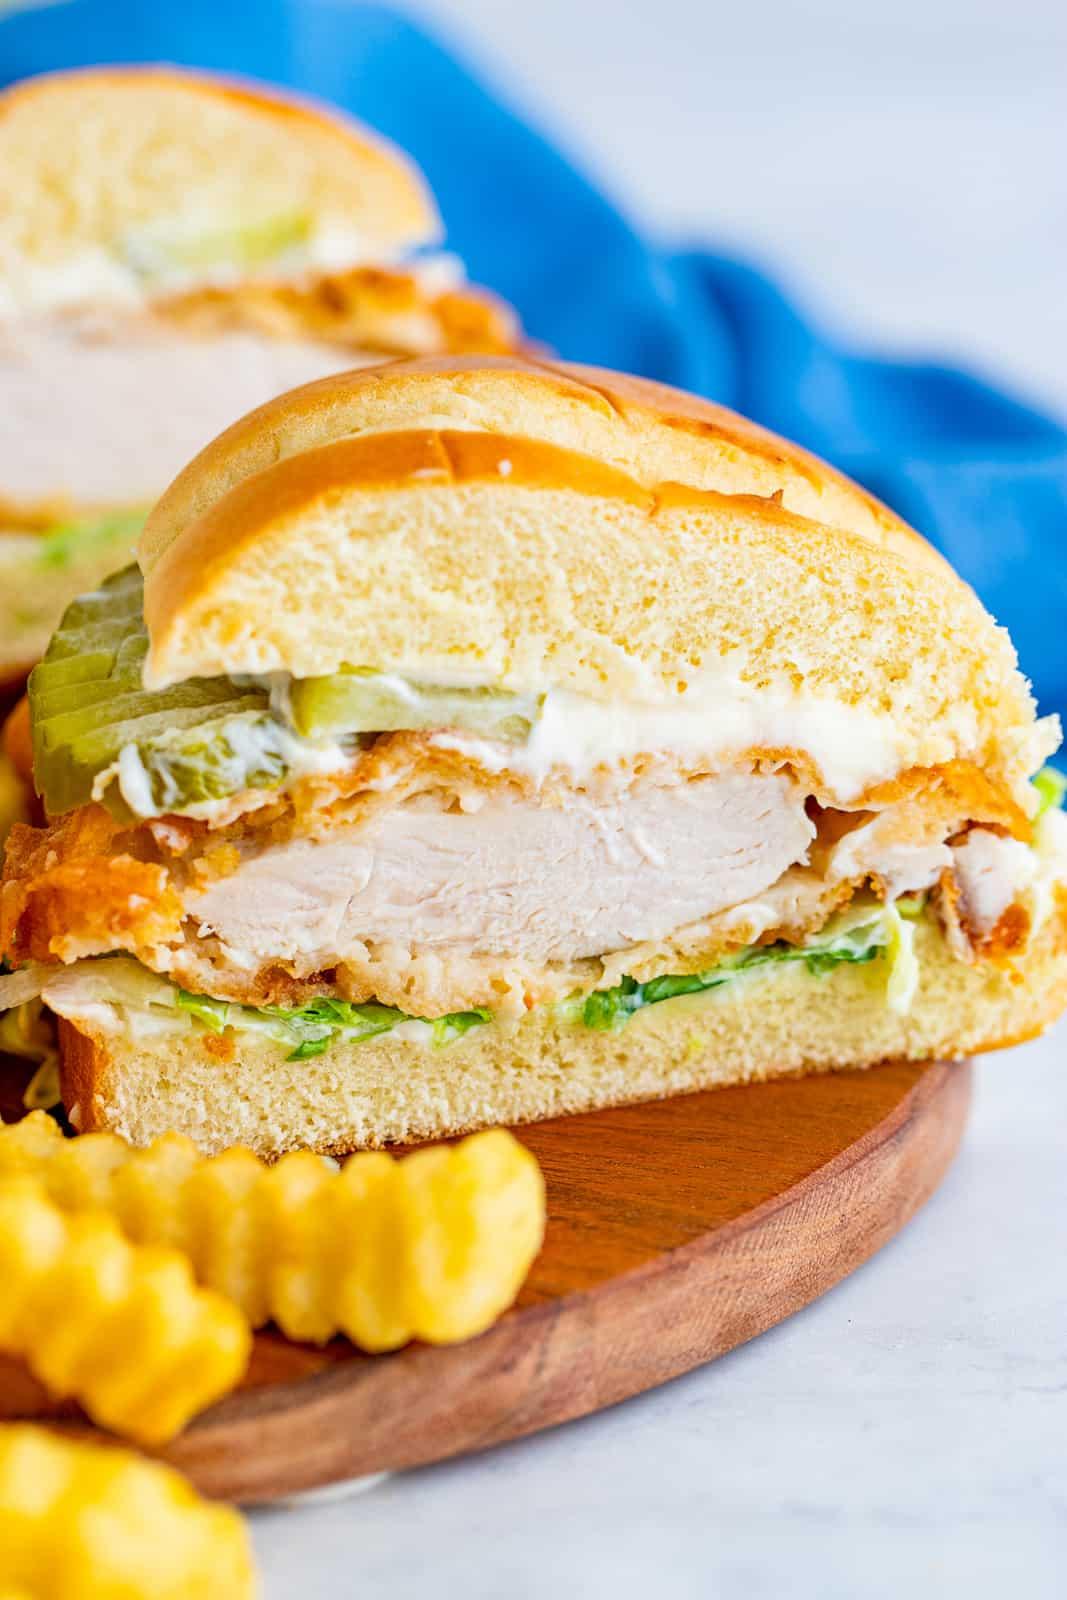 Close up of Chicken Sandwich cut in half on wooden board